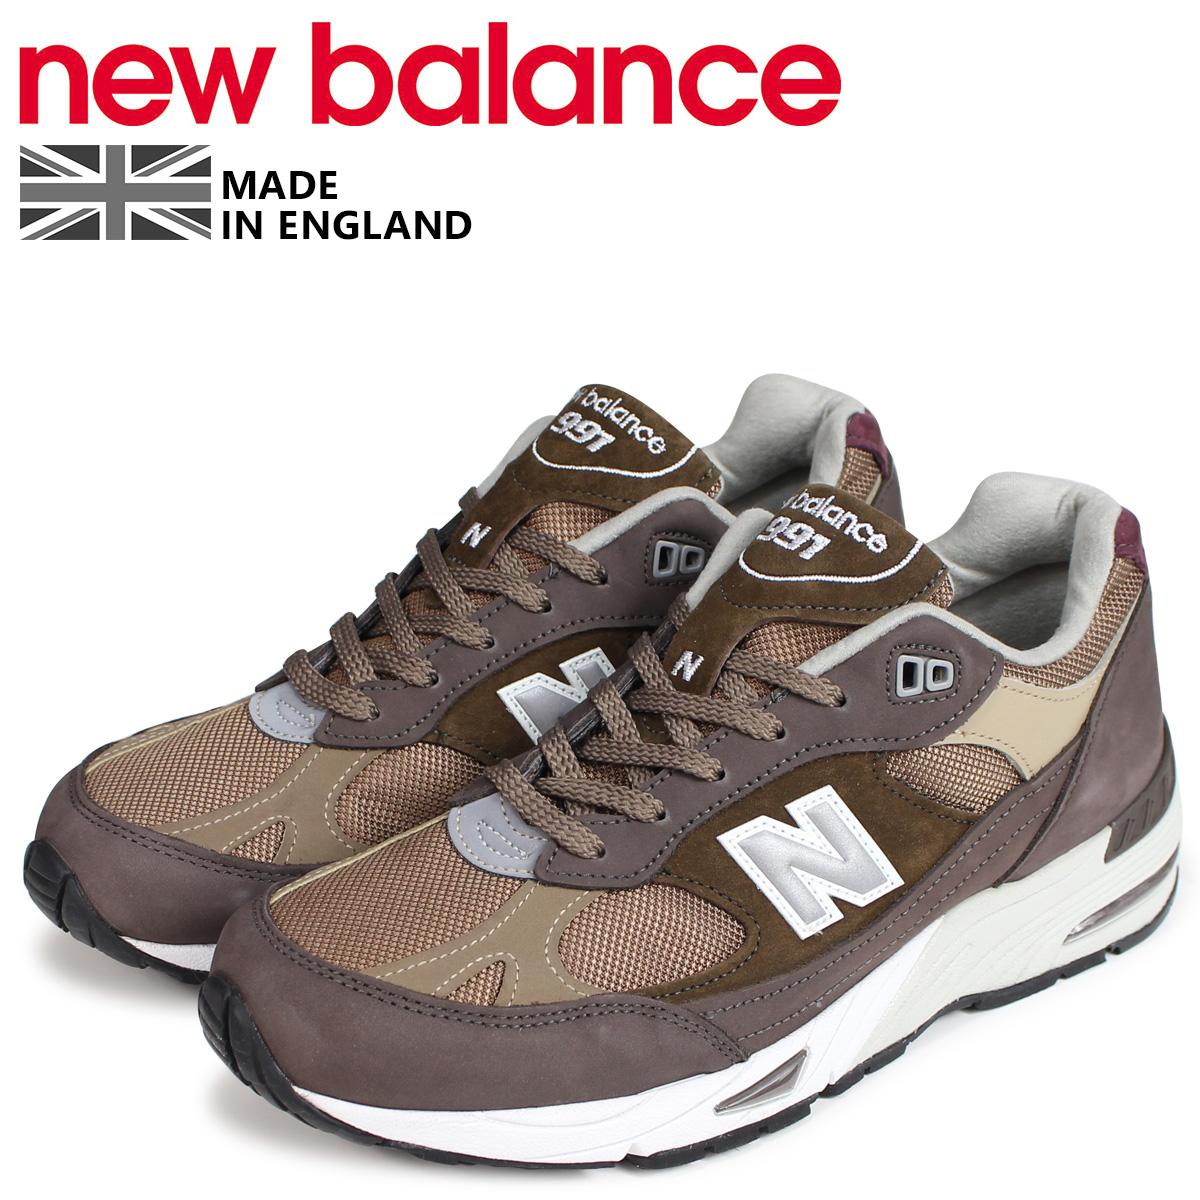 new balance 991 メンズ ニューバランス スニーカー M991NGG Dワイズ MADE IN UK ブラウン [3/11 追加入荷]